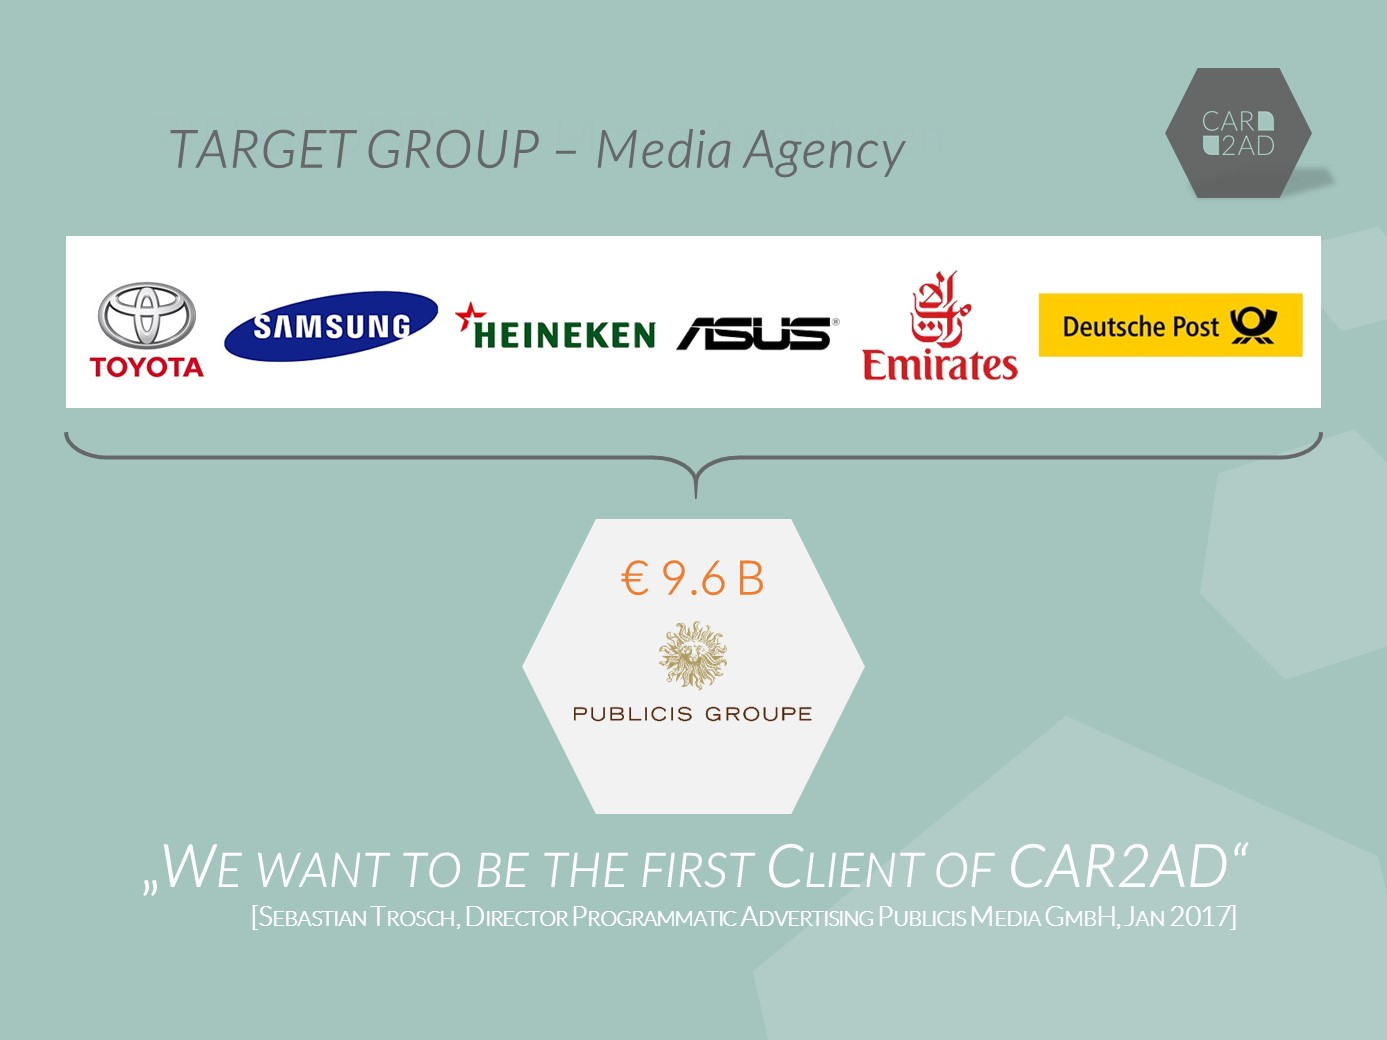 CAR2AD - Target Group